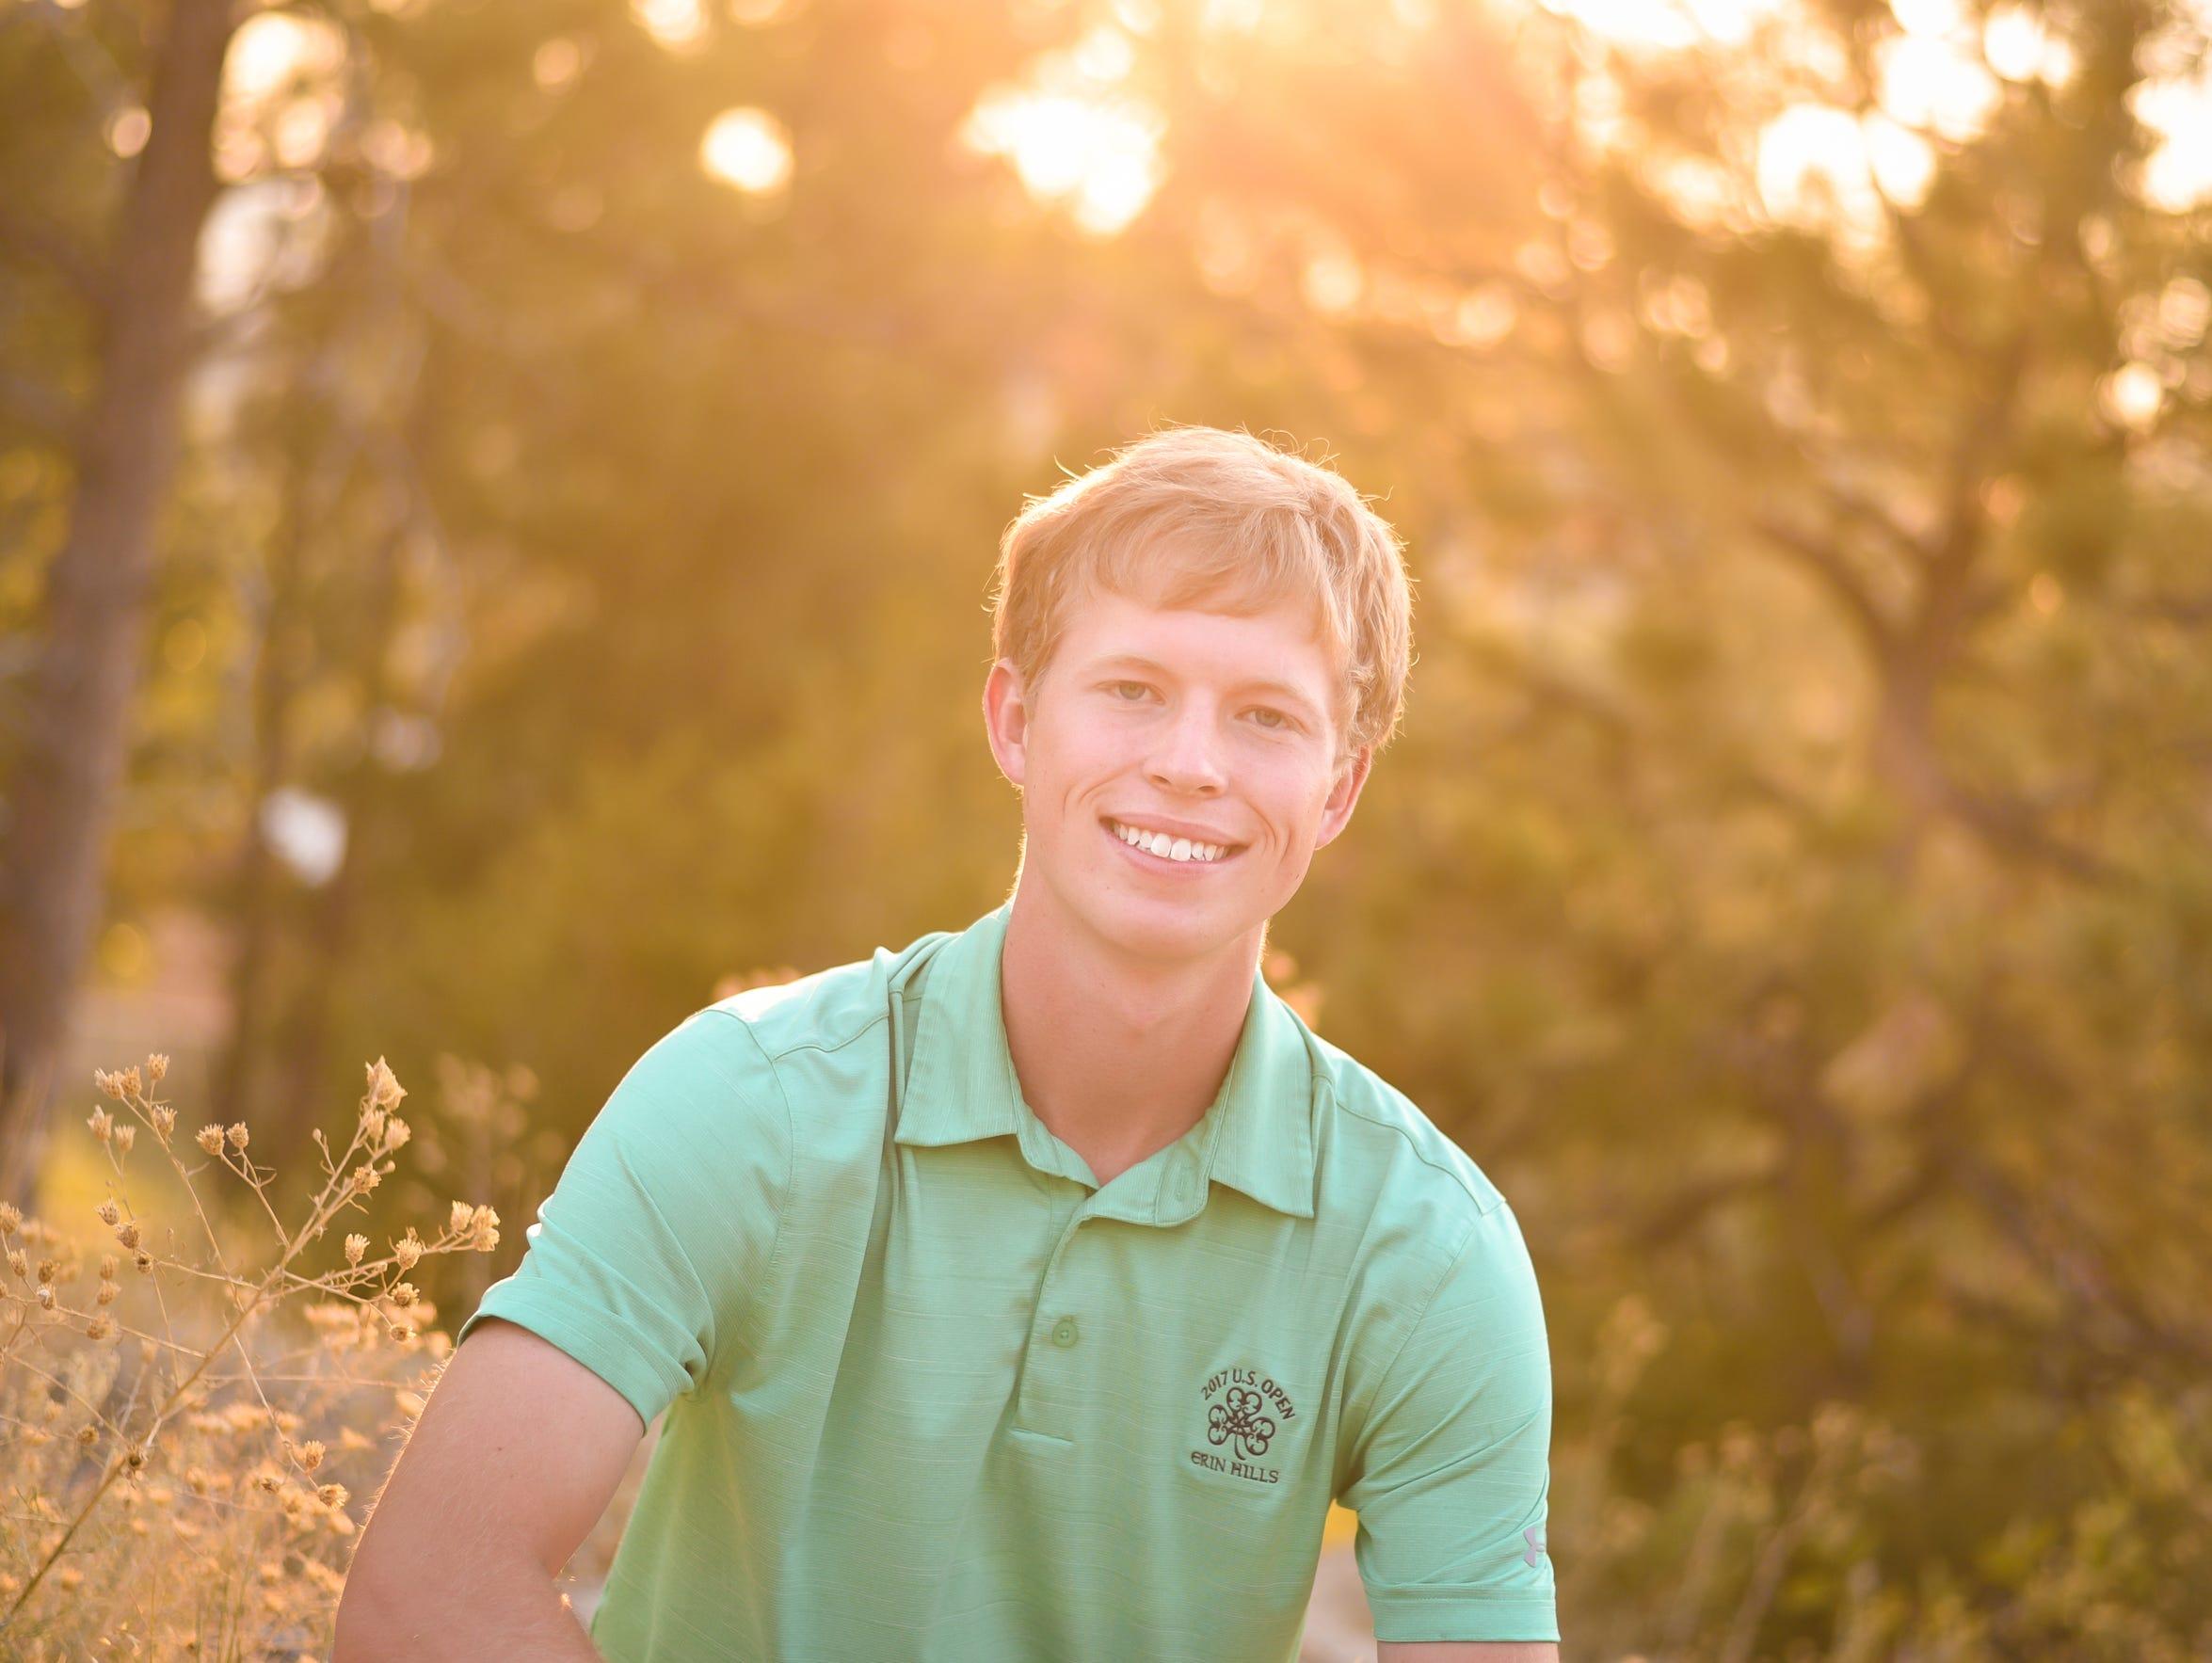 Peter Brown is a senior at Colstrip High School.